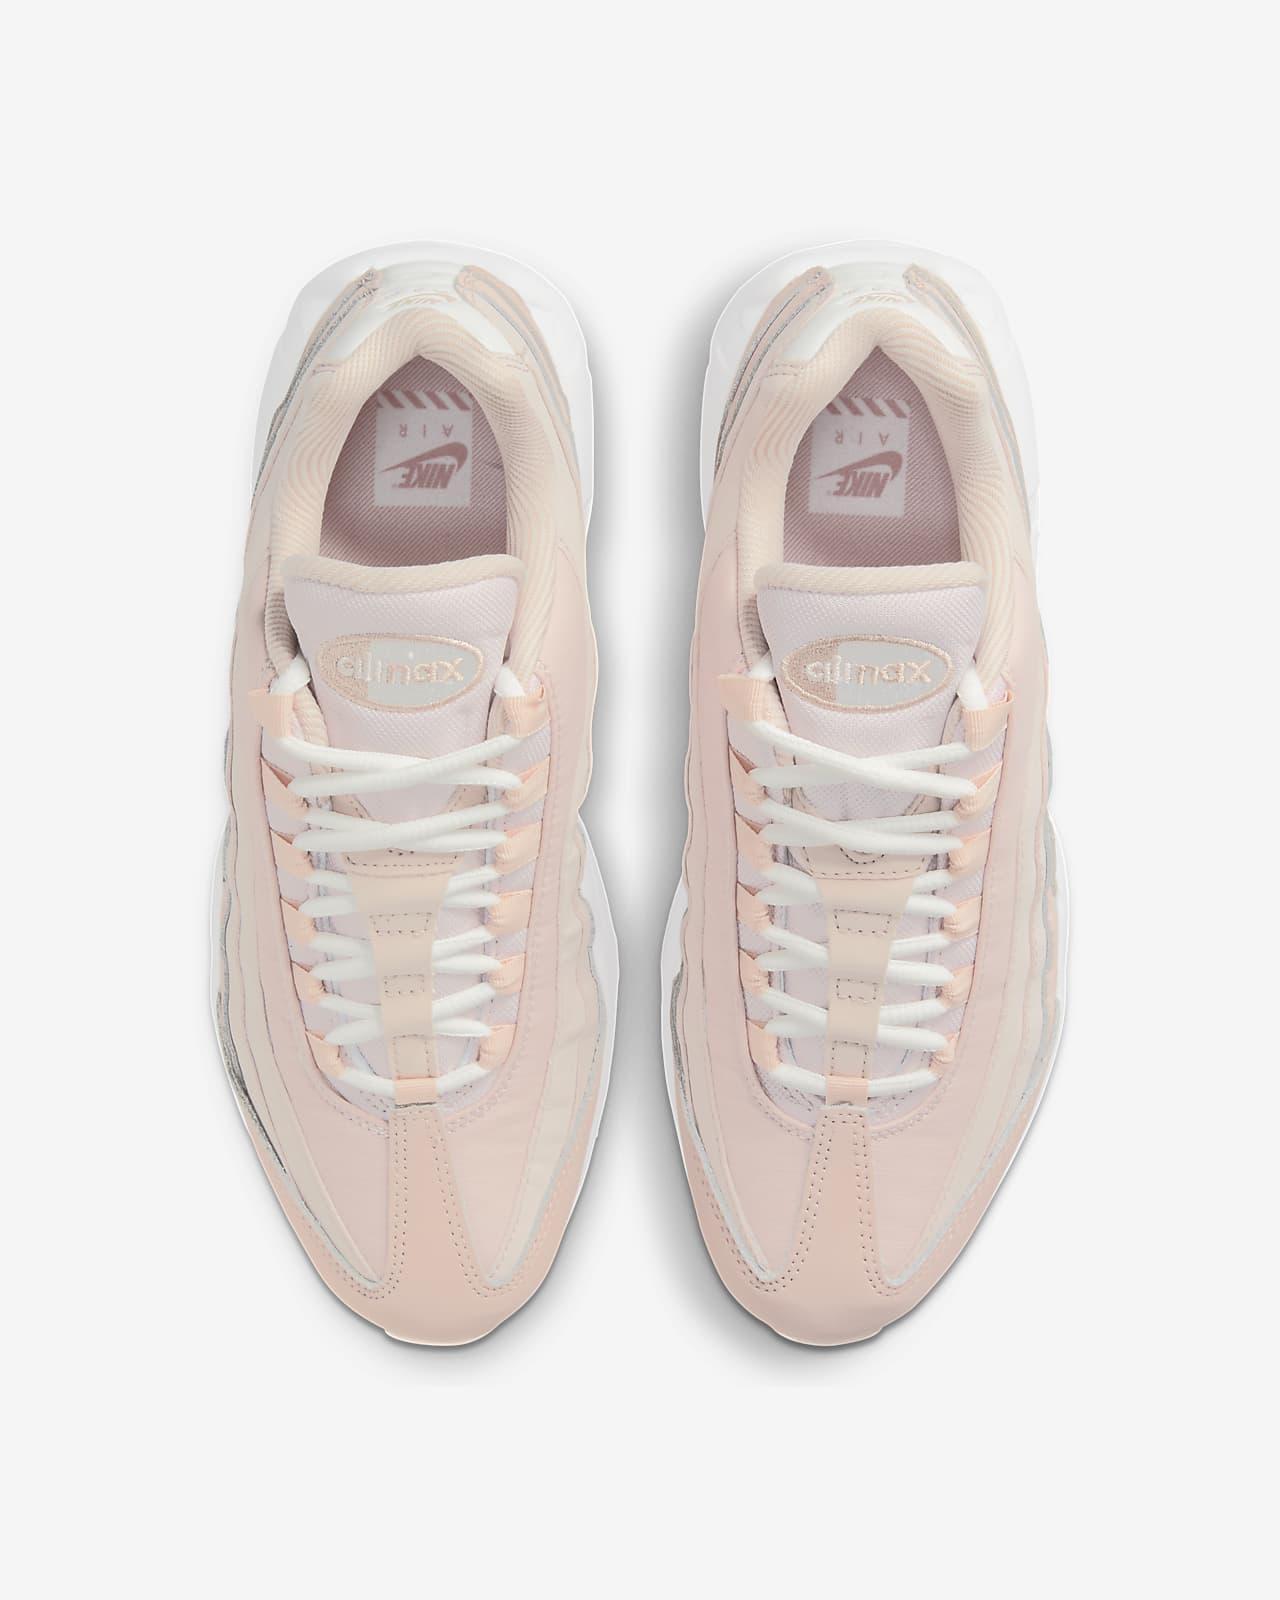 Nike Air Max 95 Women's Shoes